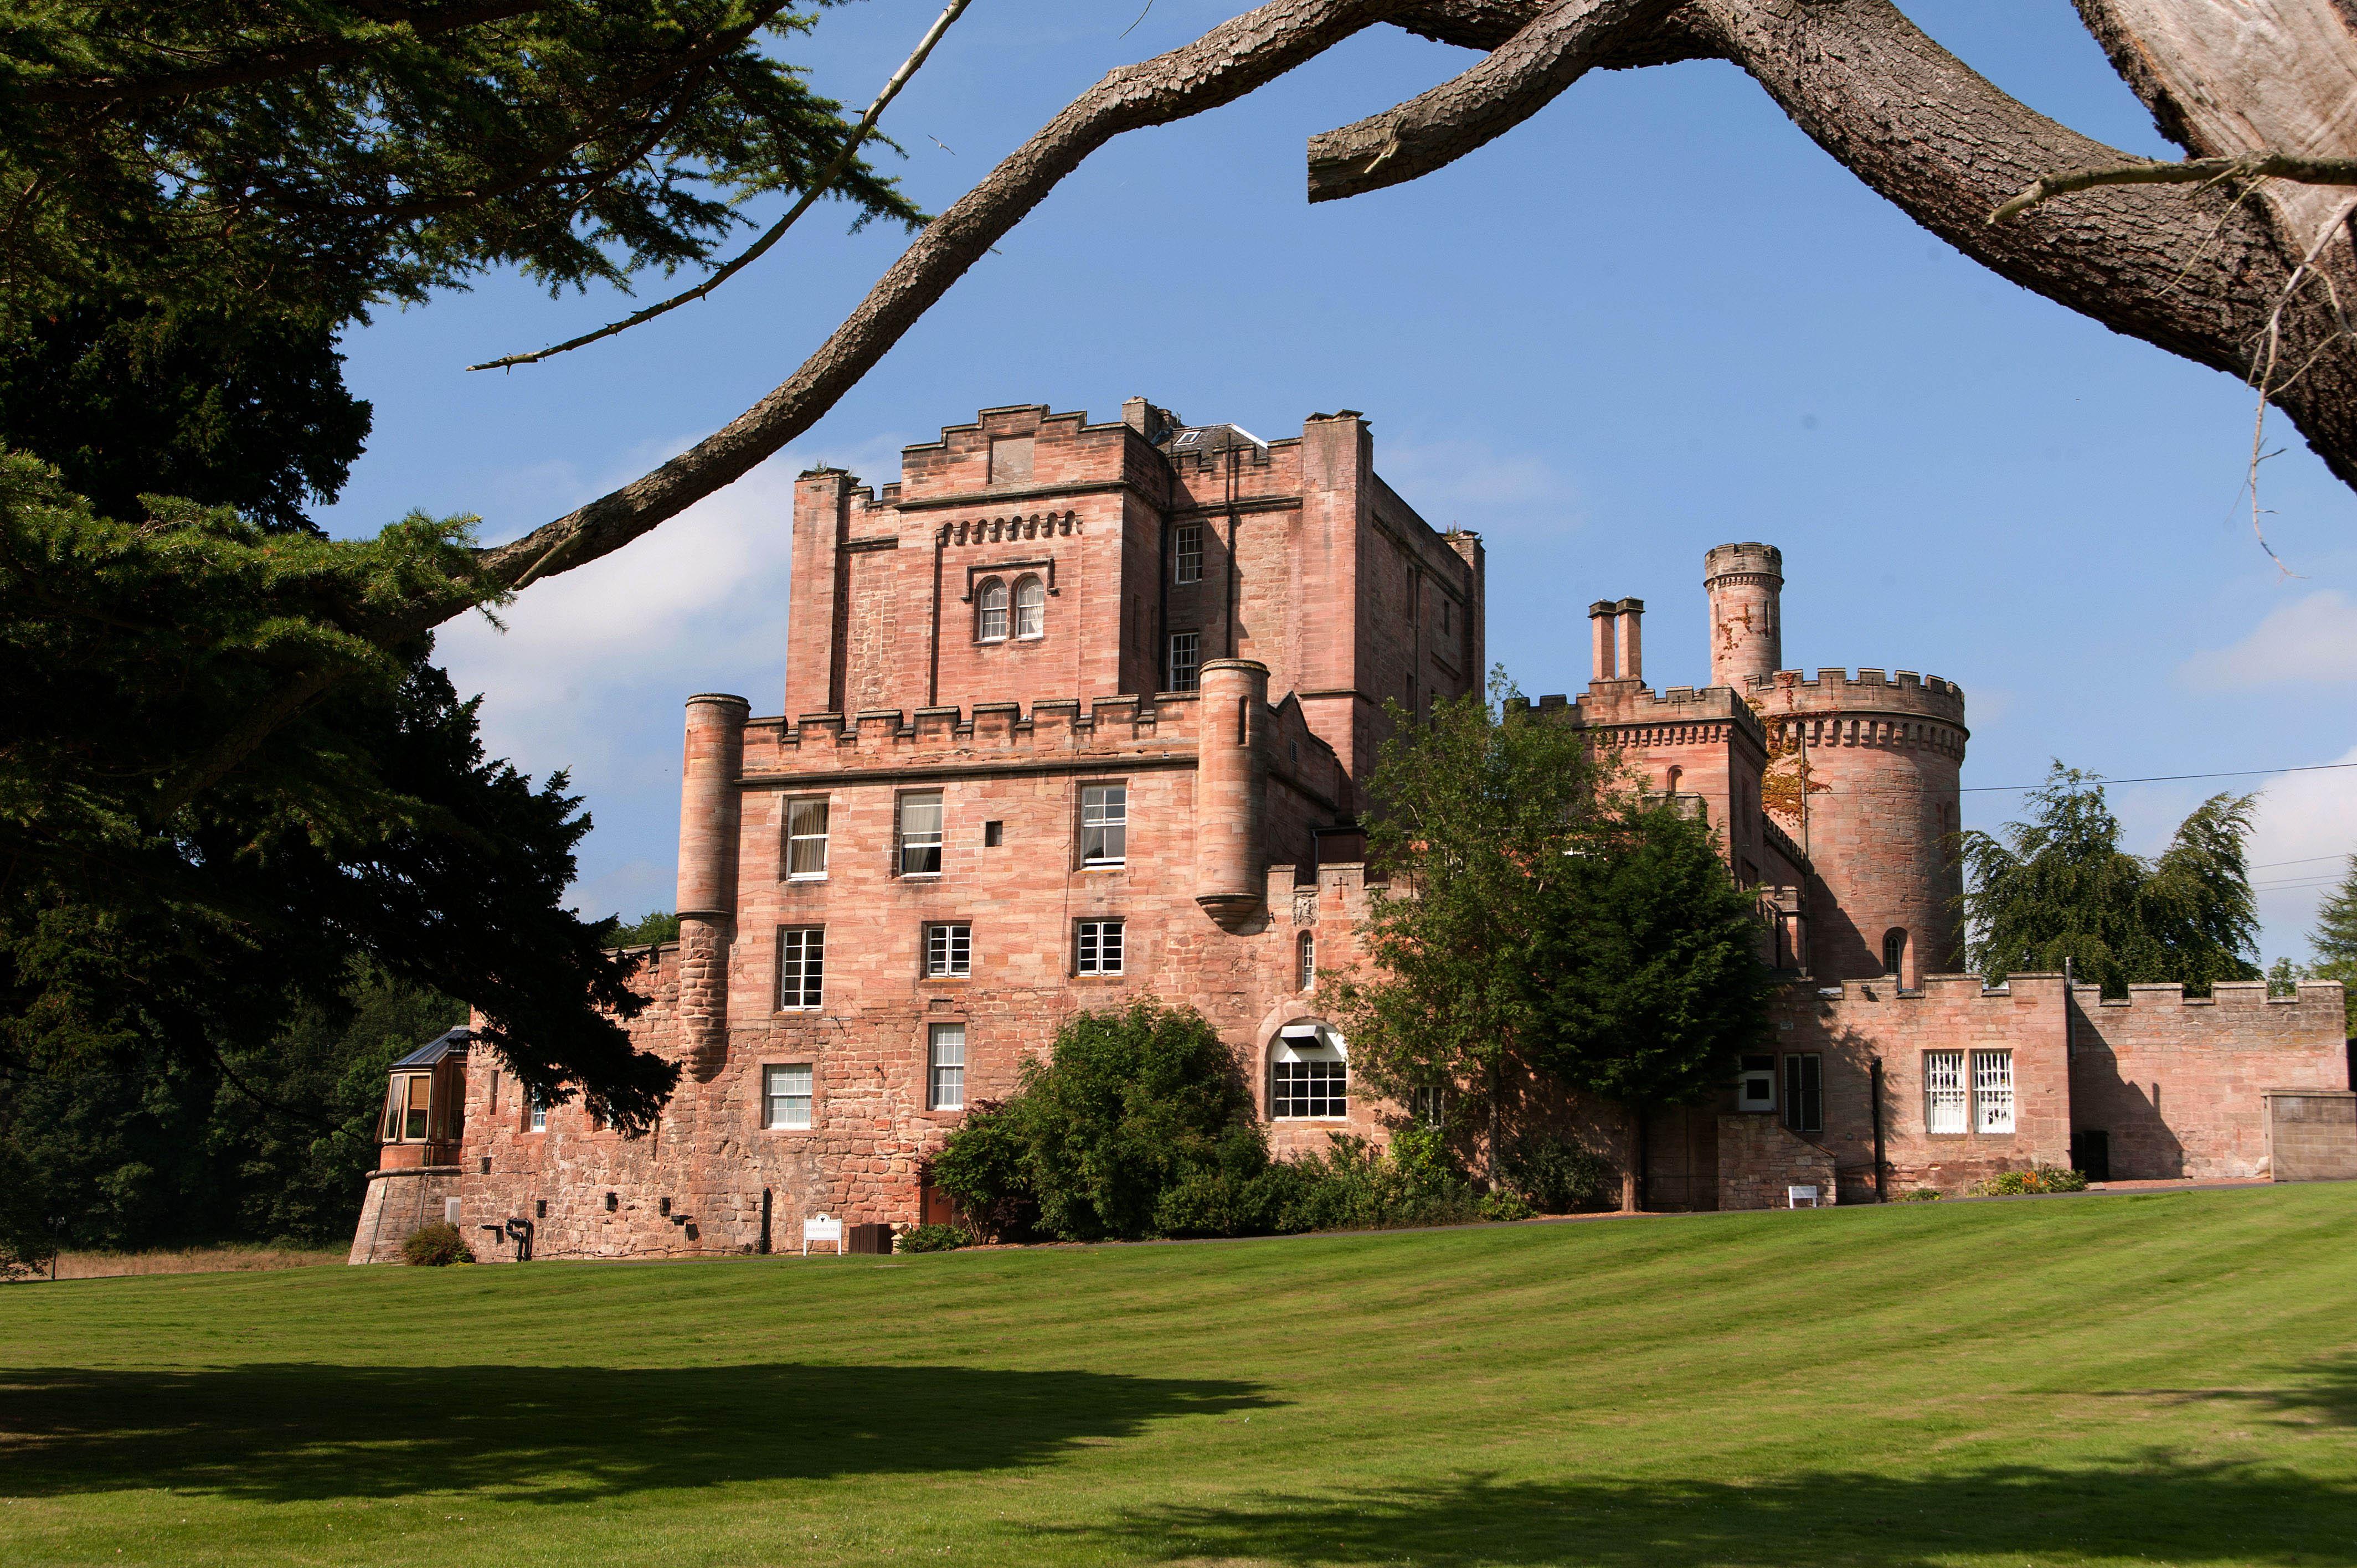 Dalhousie Castle Hotel, Midlothian, Scotland